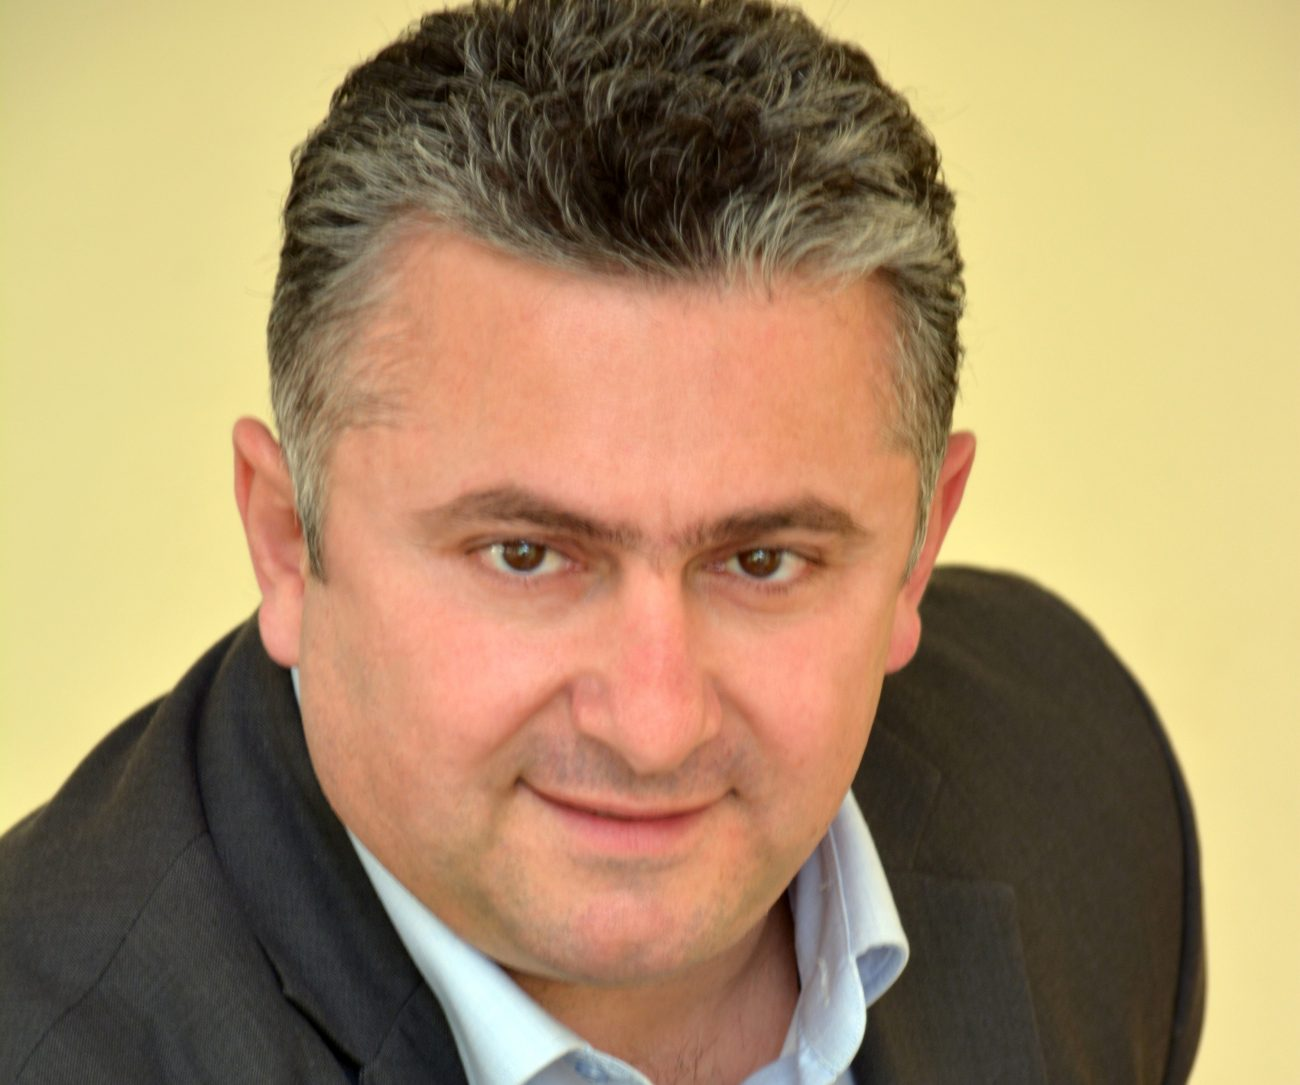 Giorgos-Kyriakidis